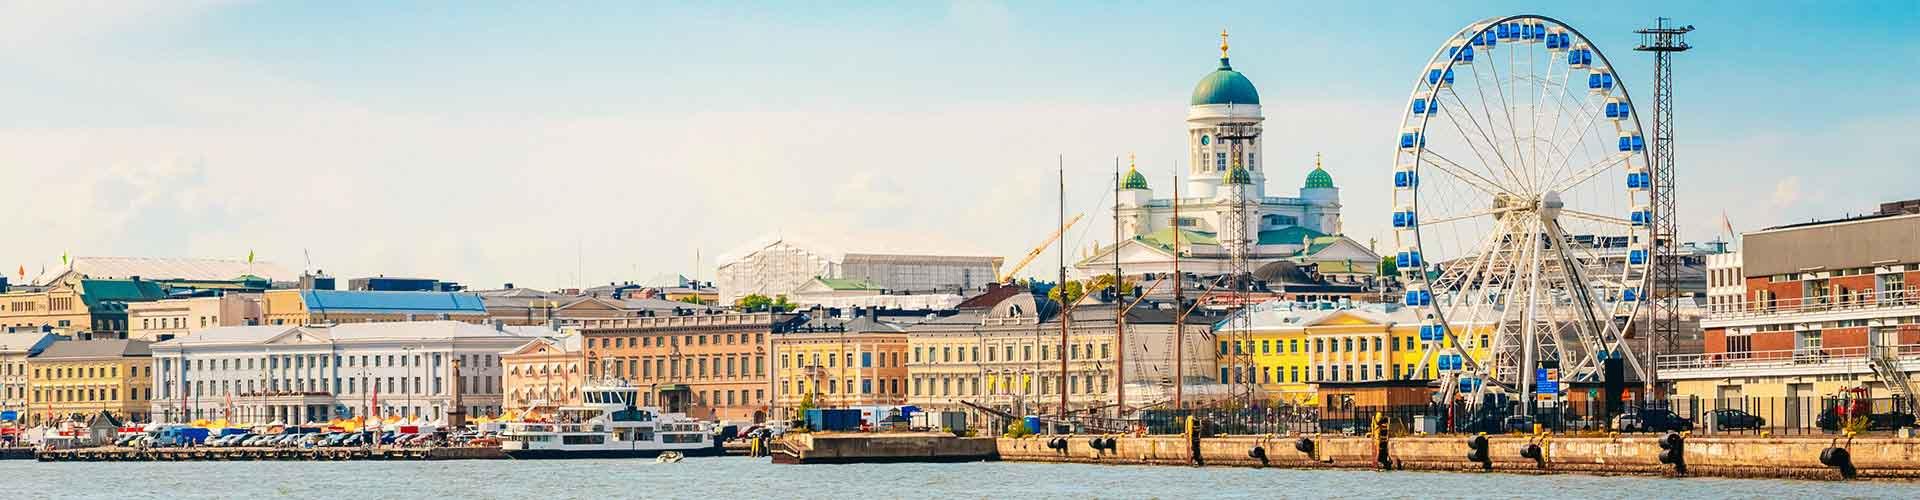 Helsinki - Ubytovny v Helsinki. Mapy pro Helsinki, fotky a recenze pro každý Ubytovnu - Helsinki.